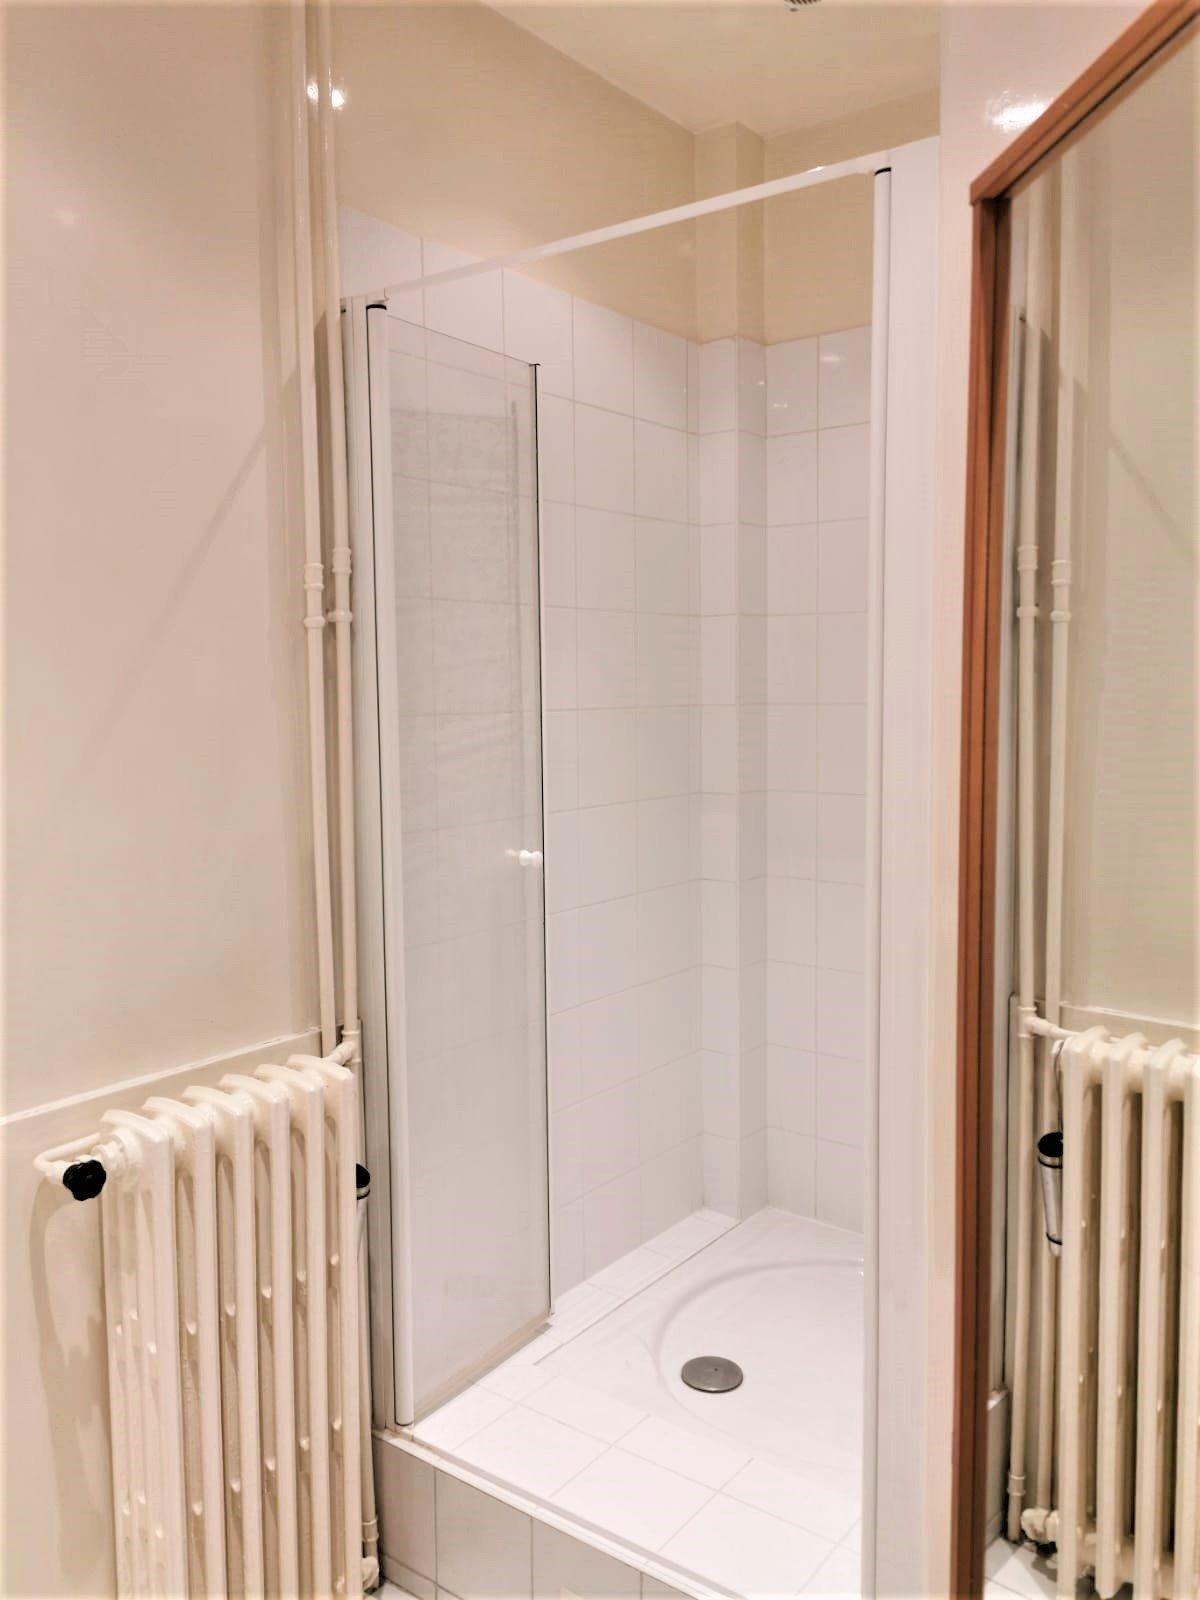 Rental Apartment - Paris 16th (Paris 16ème) Muette